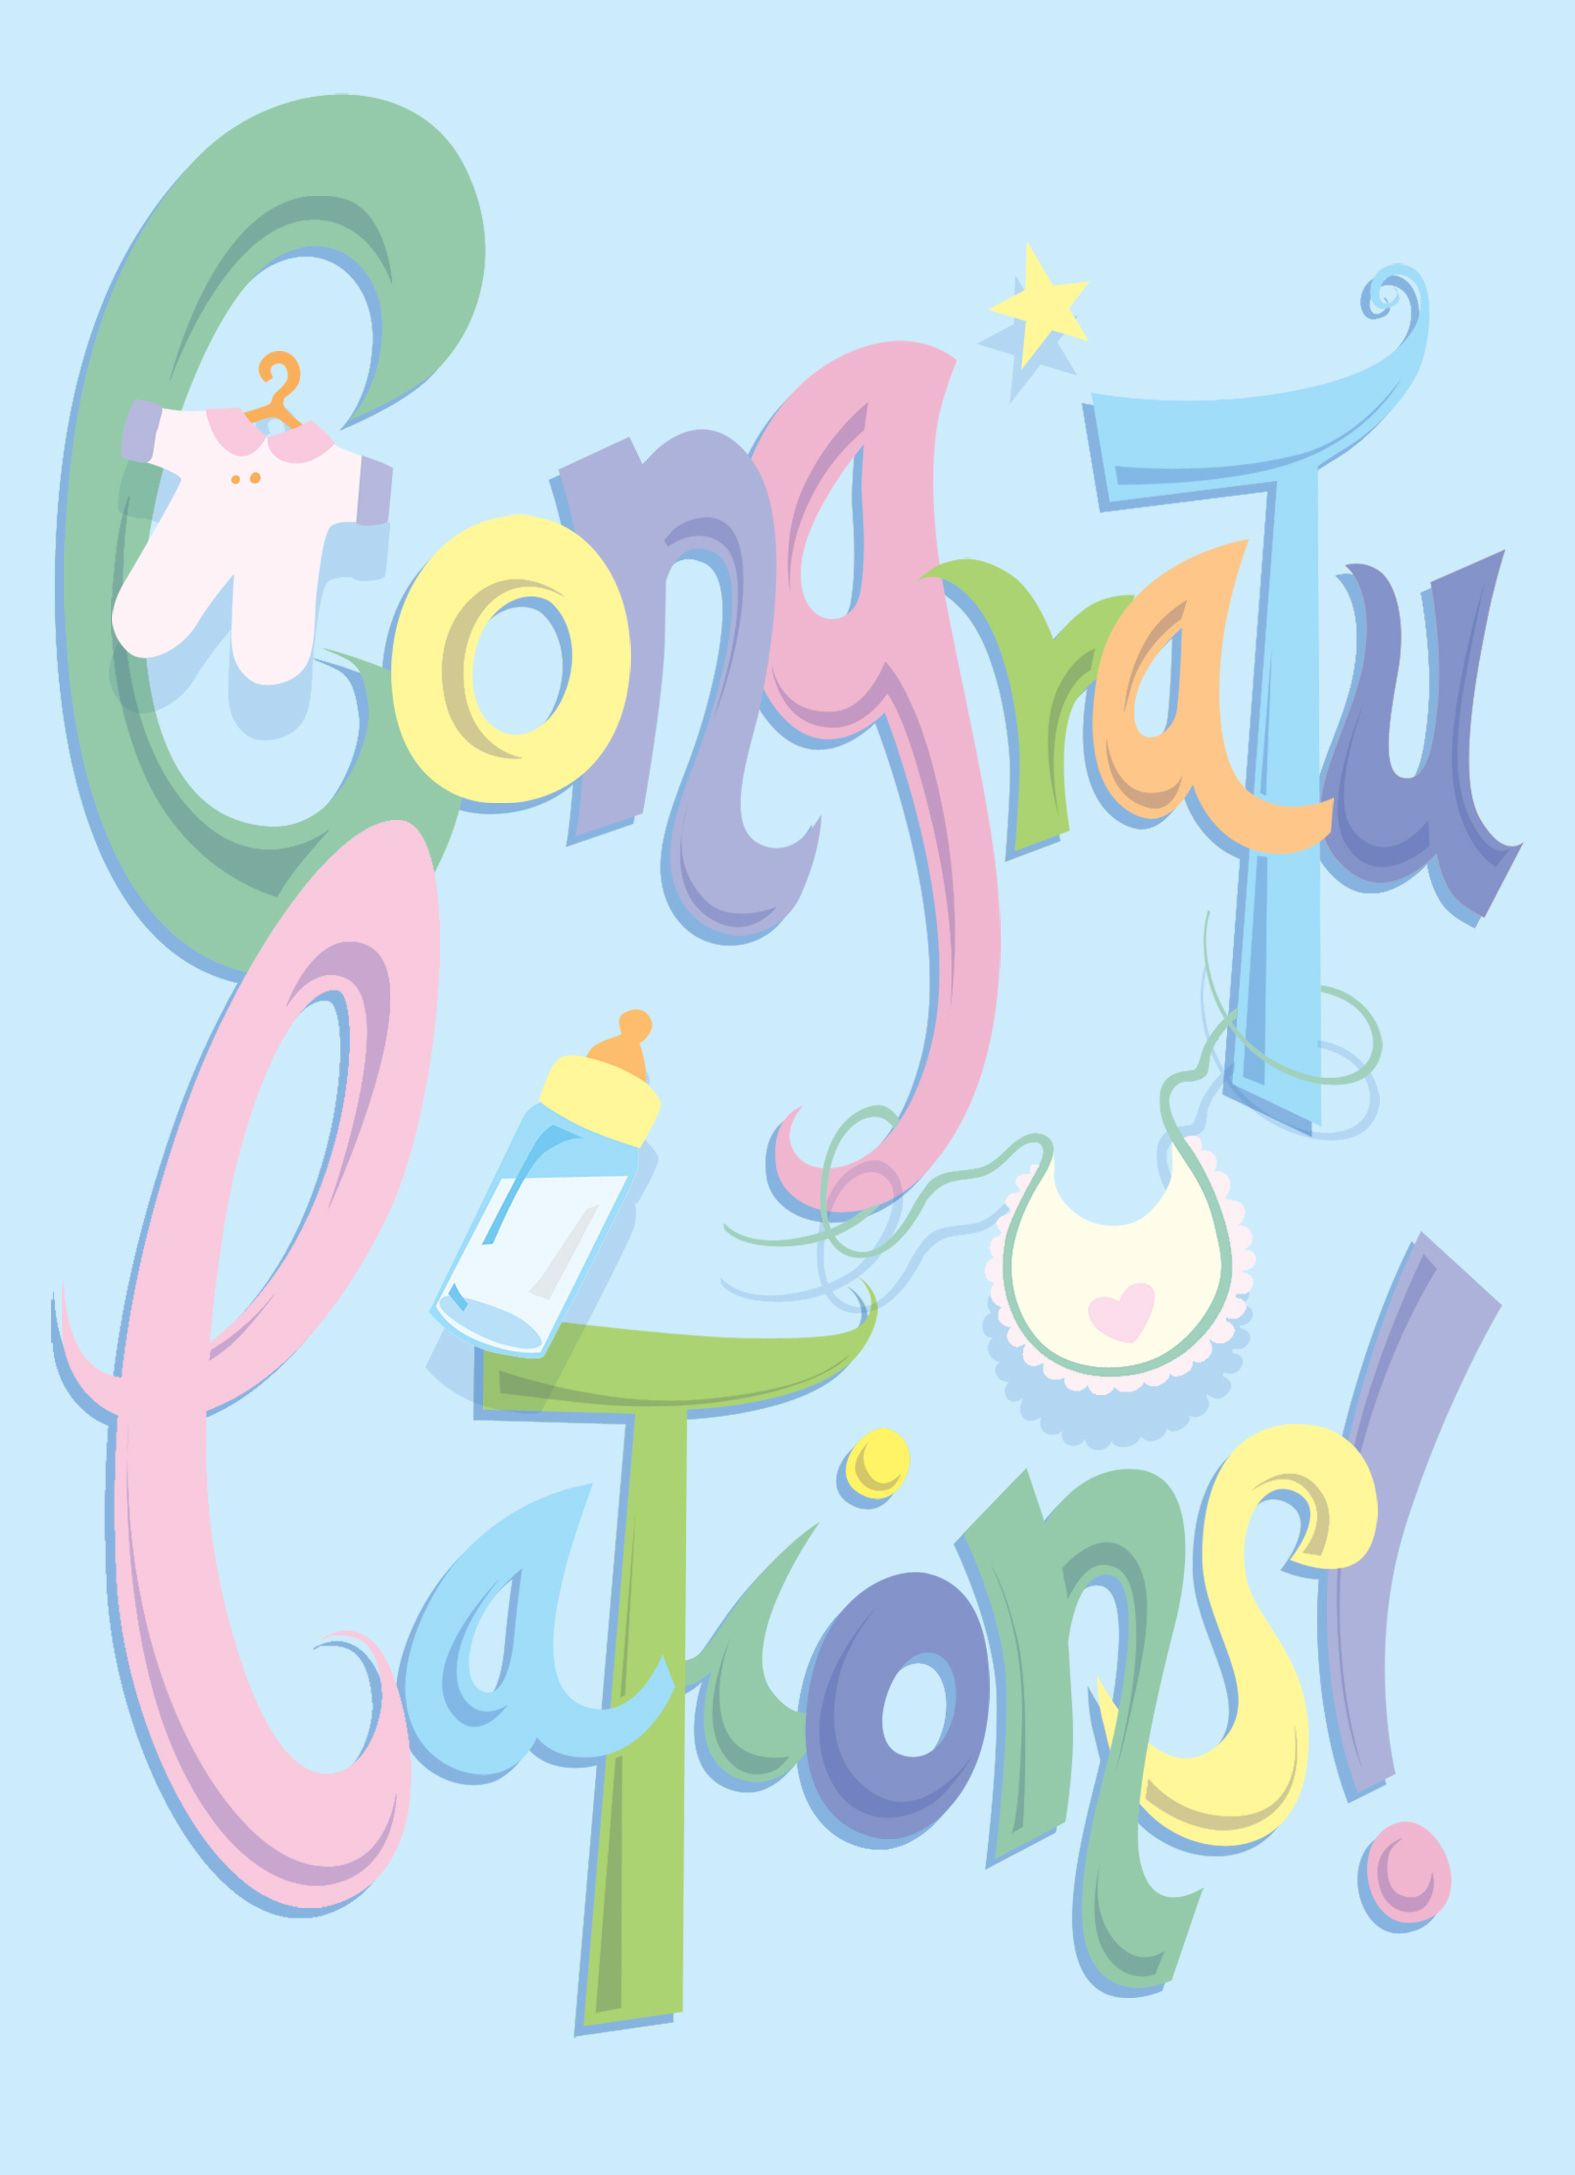 Medium Of Congrats On Baby